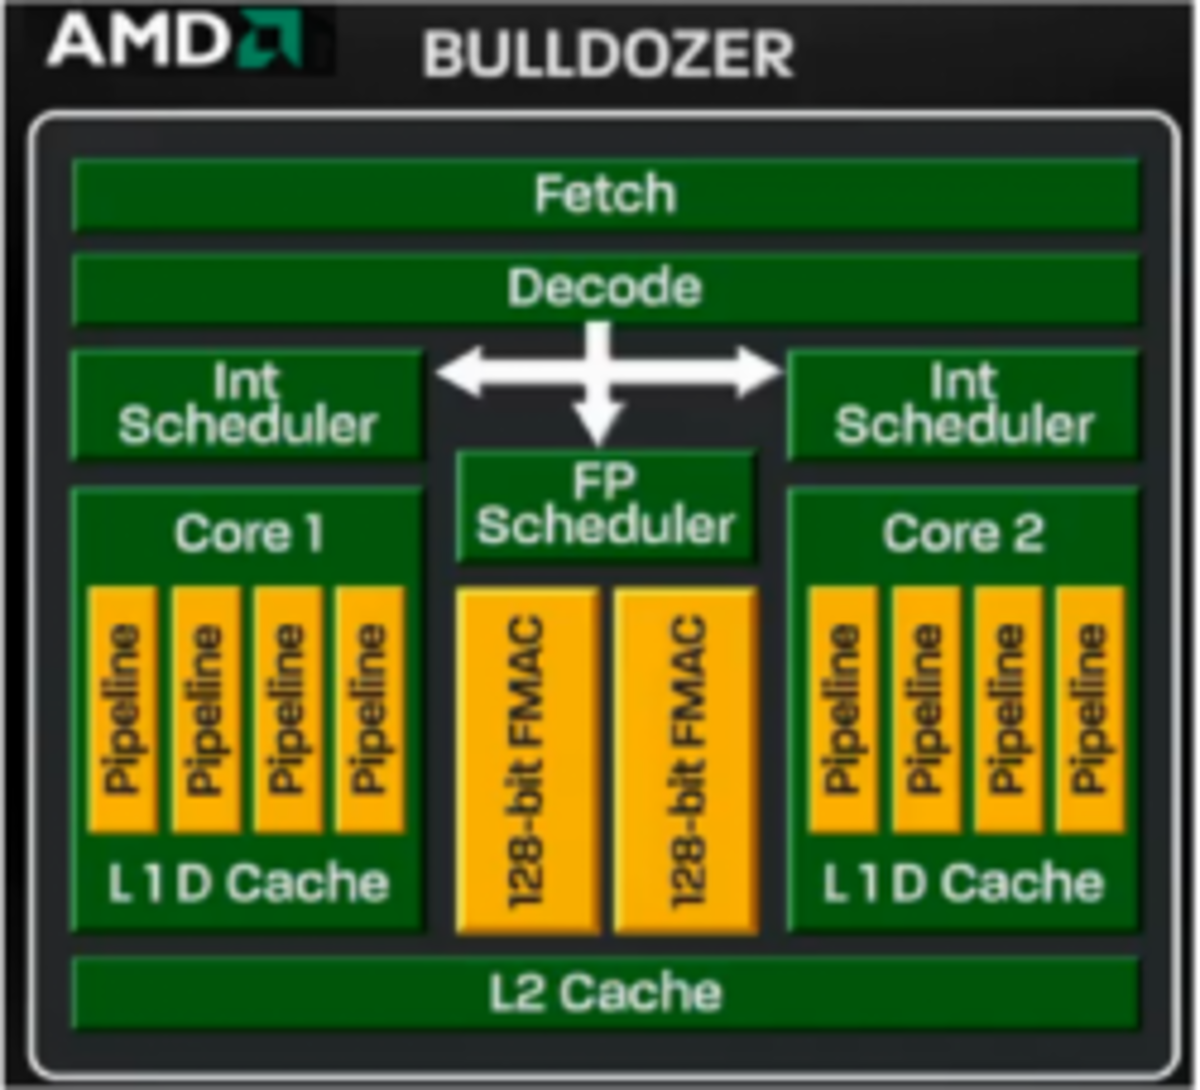 AMD Bulldozer Microarchitechture